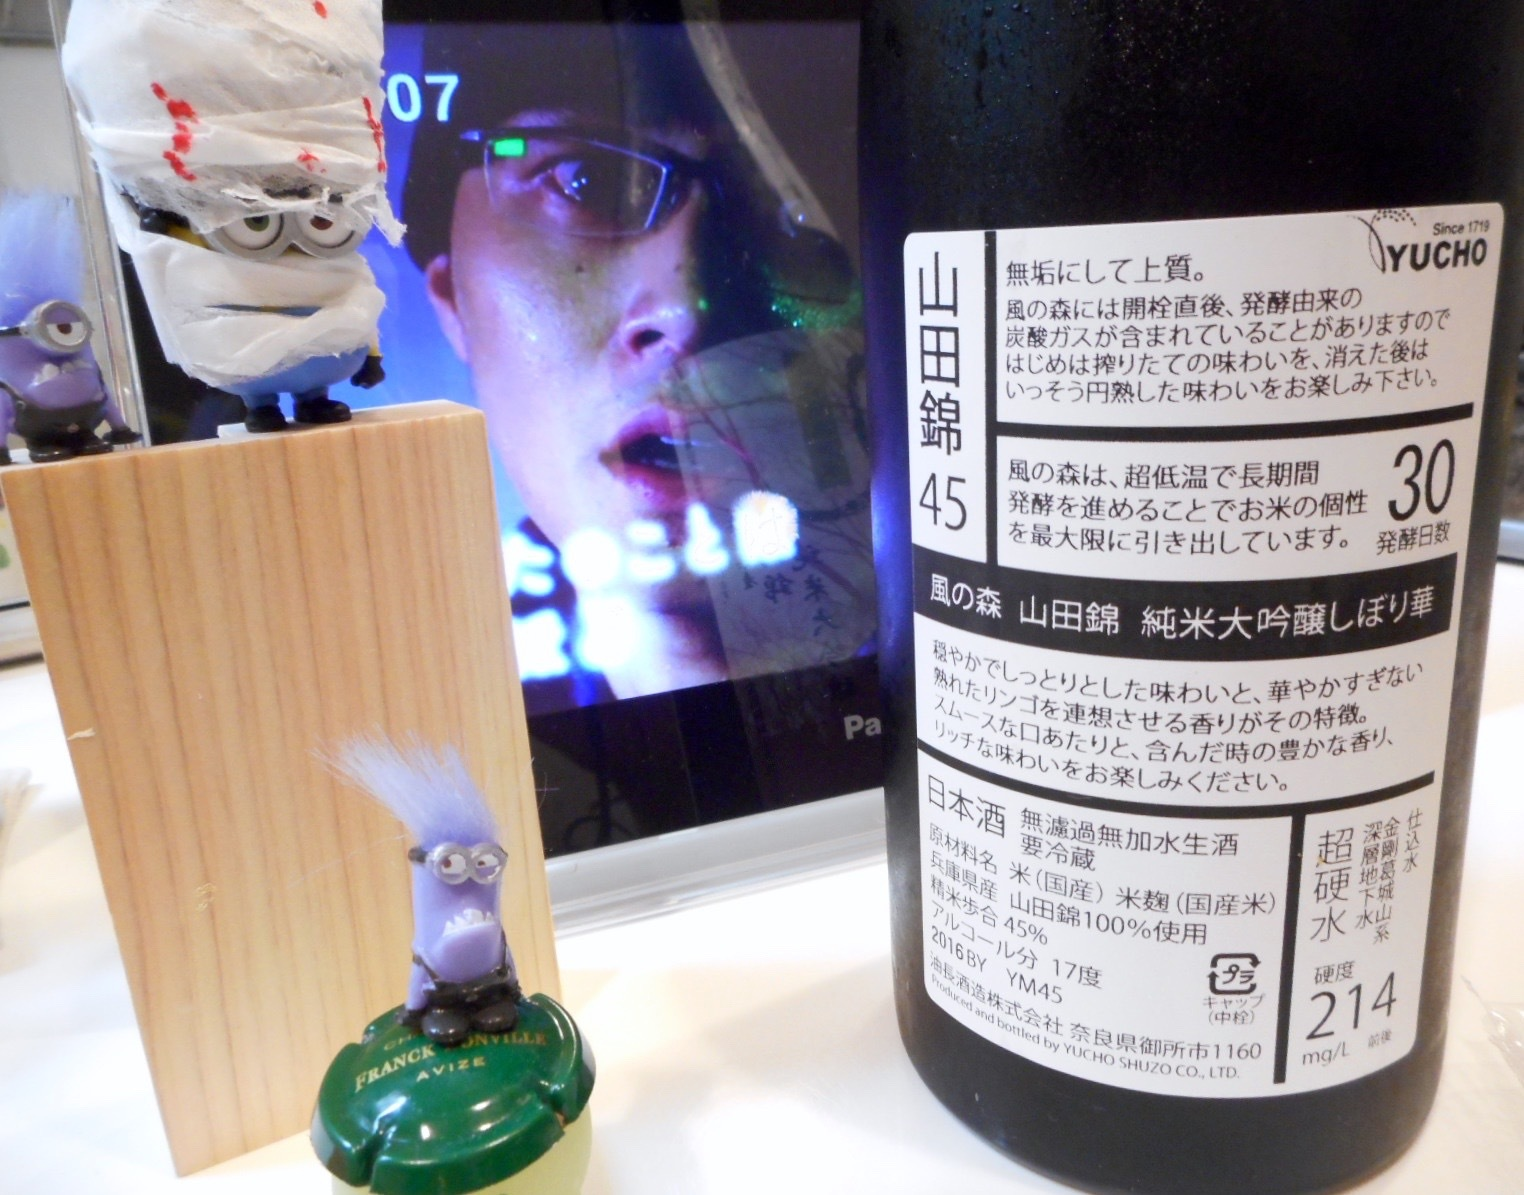 kazenomori_yamada45_28by2.jpg